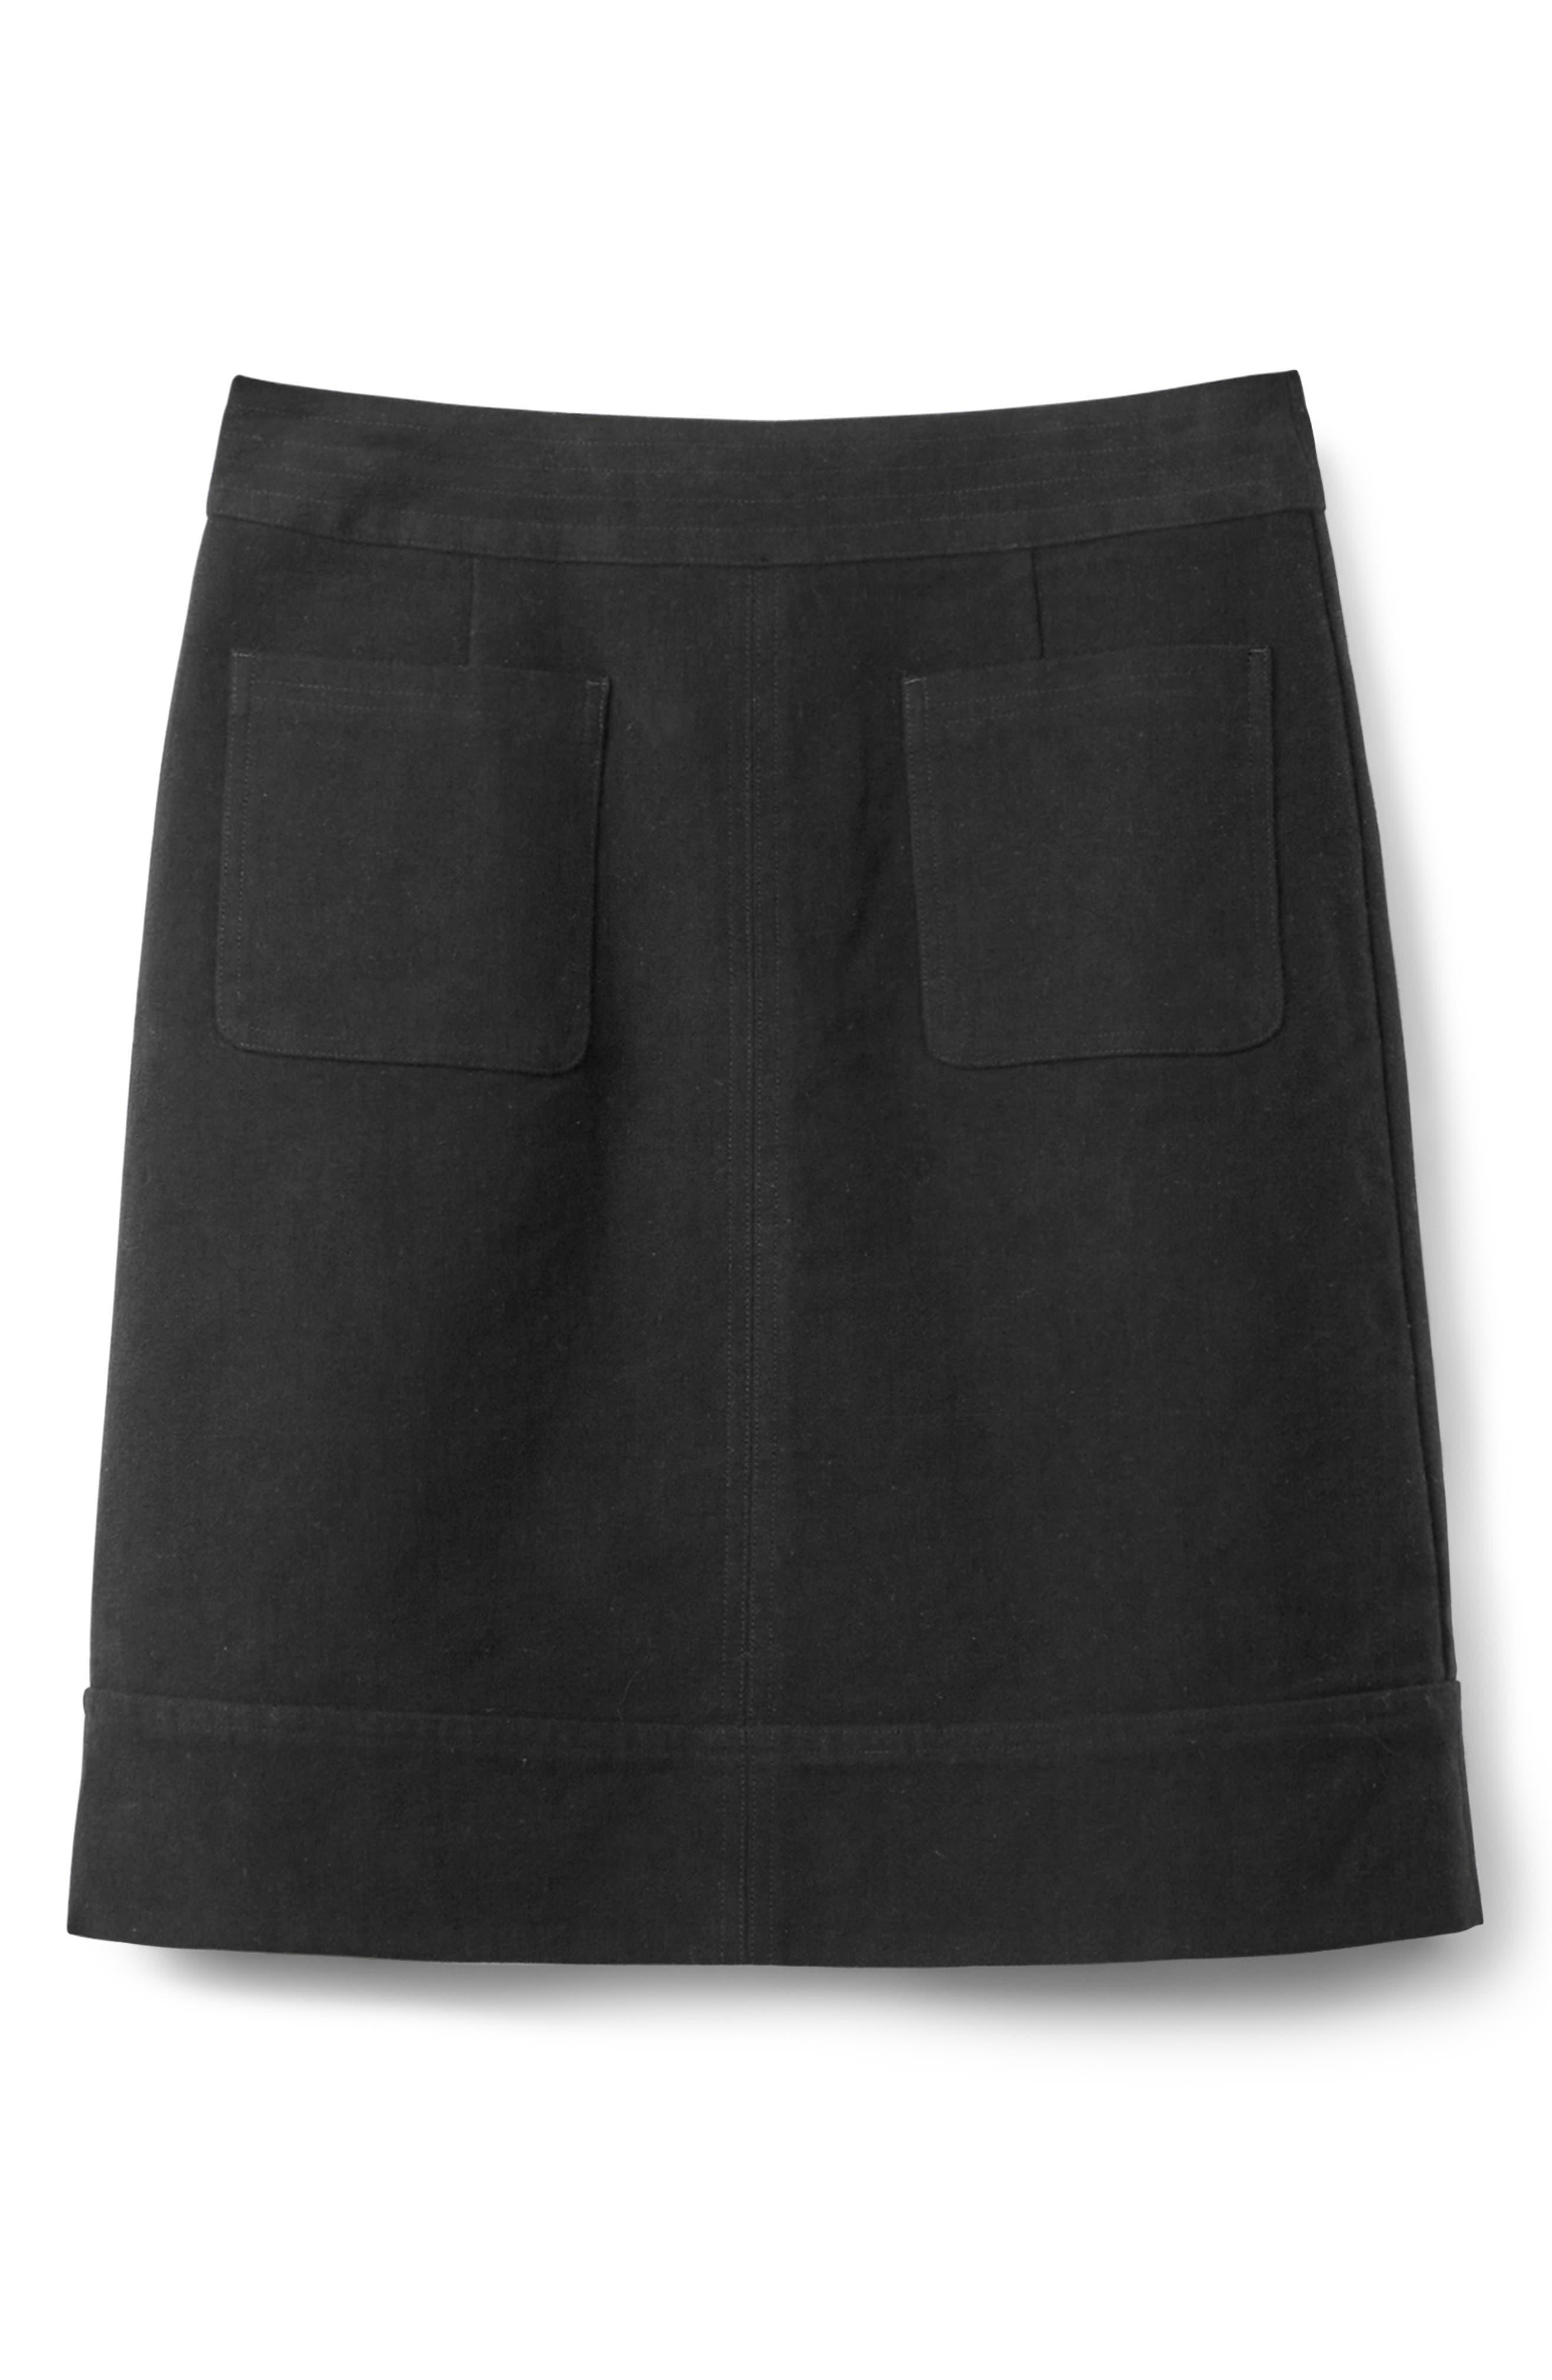 BODEN,                             Dorchester Patch Pocket Stretch Cotton Miniskirt,                             Alternate thumbnail 5, color,                             001